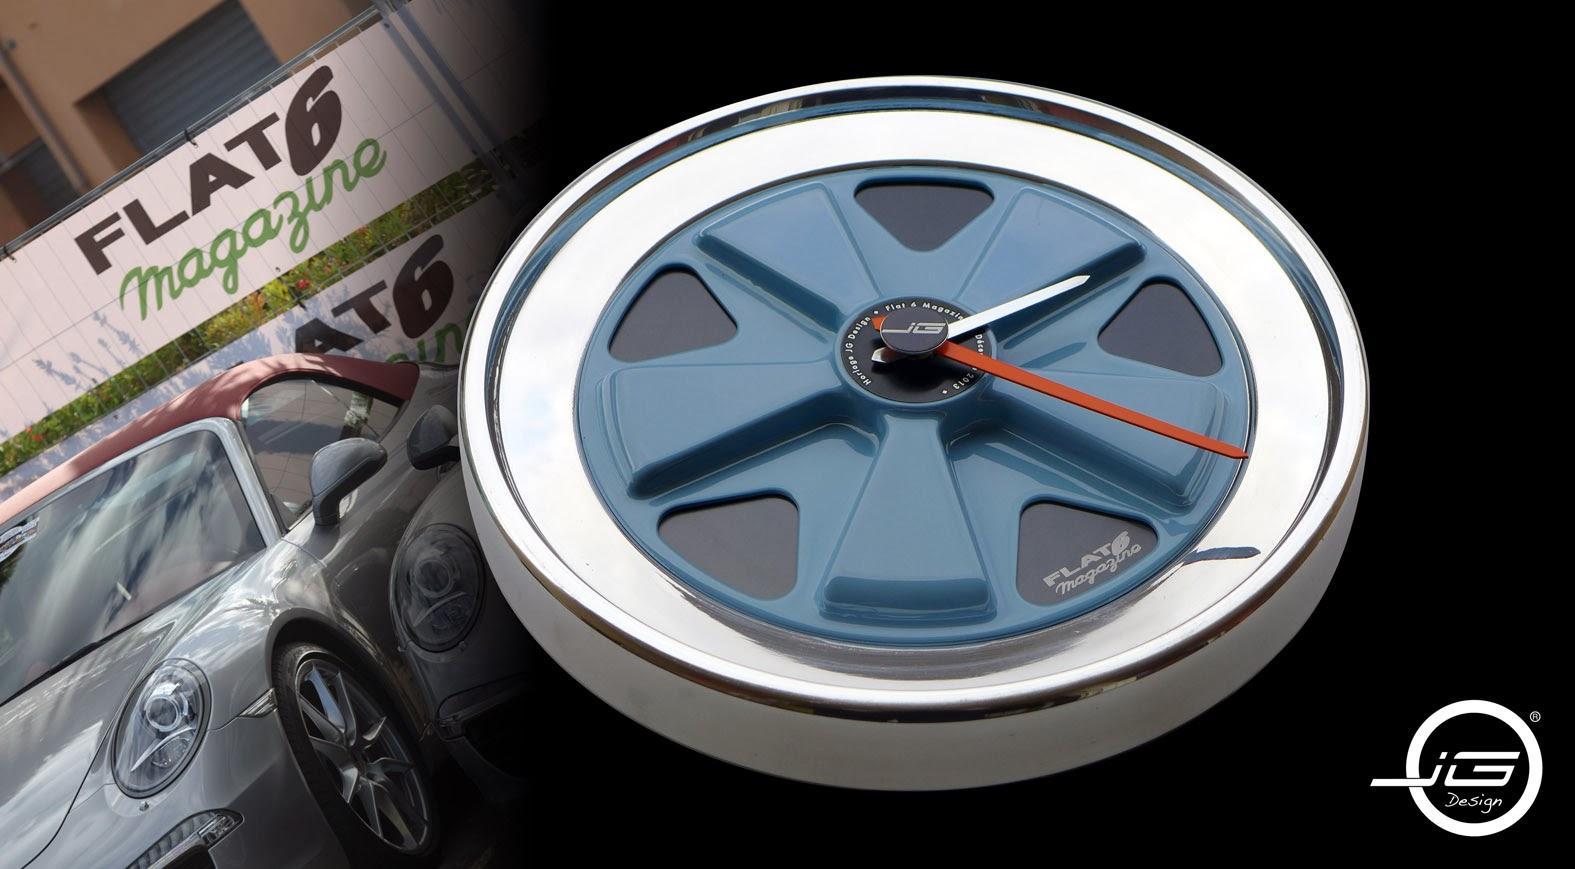 jo l goyer design horloge flat six magazine flat 6 wallclock. Black Bedroom Furniture Sets. Home Design Ideas